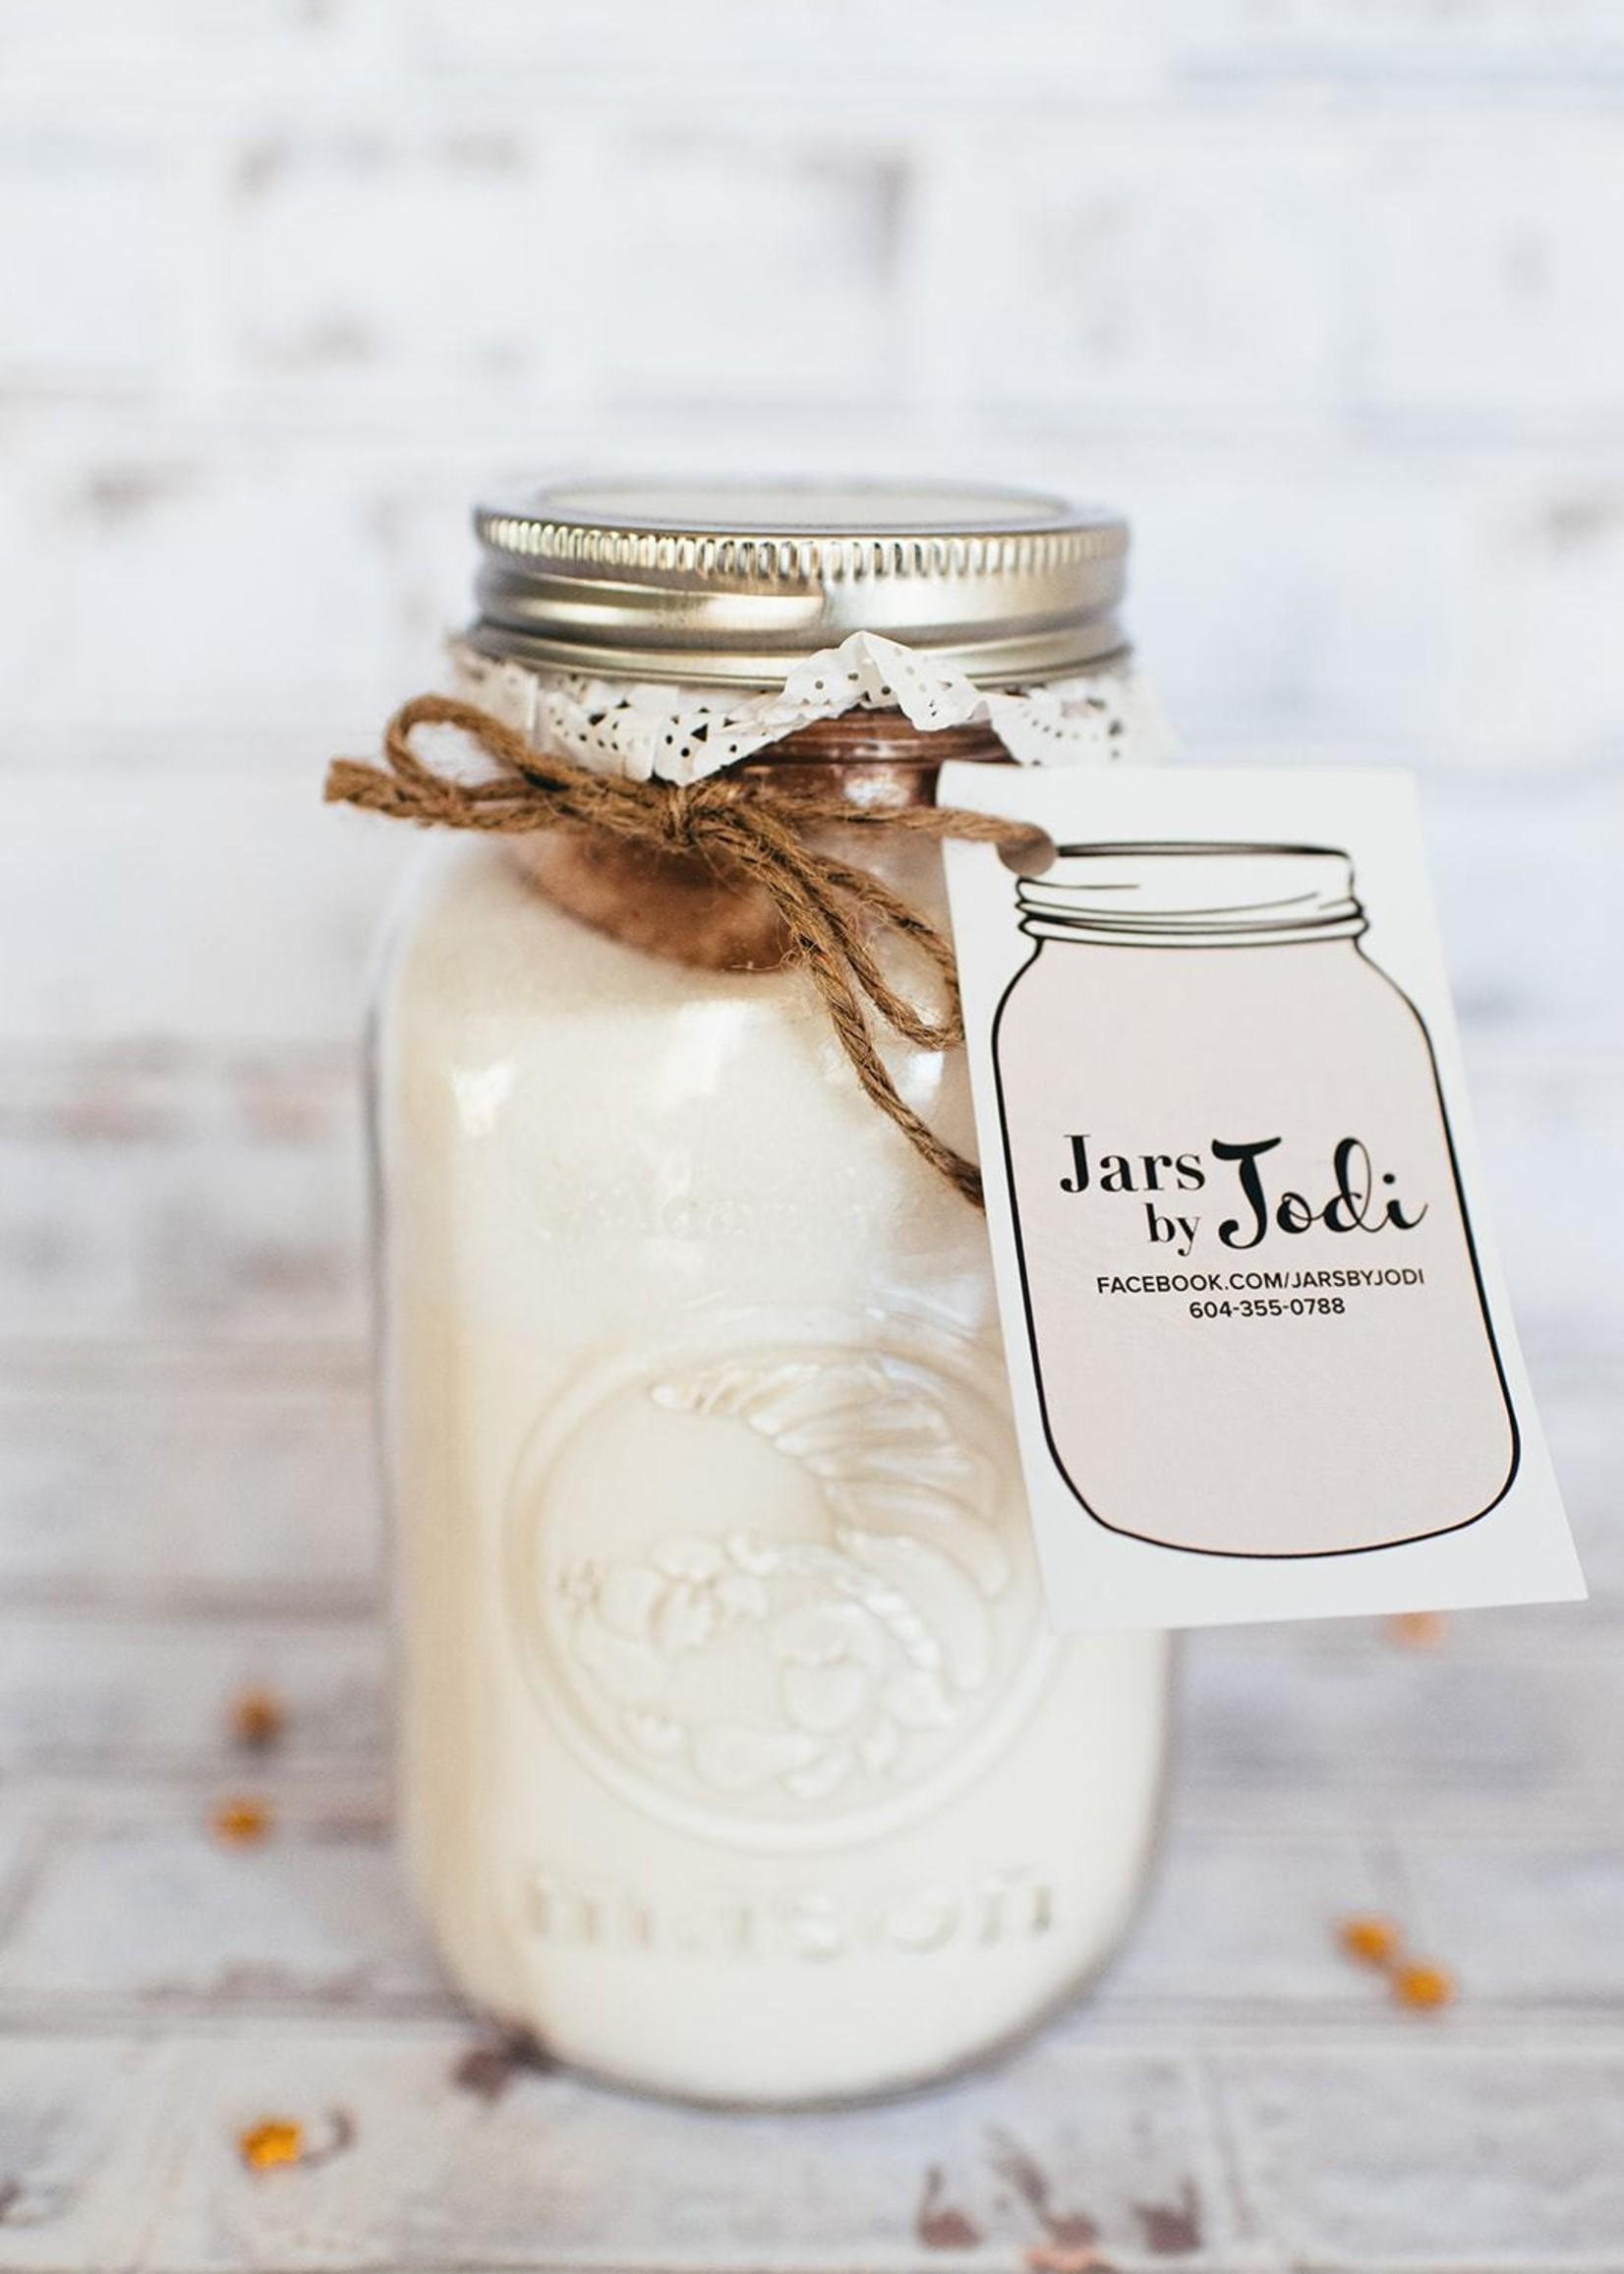 Jars By Jodi Snickerdoodle Cookies | Regular